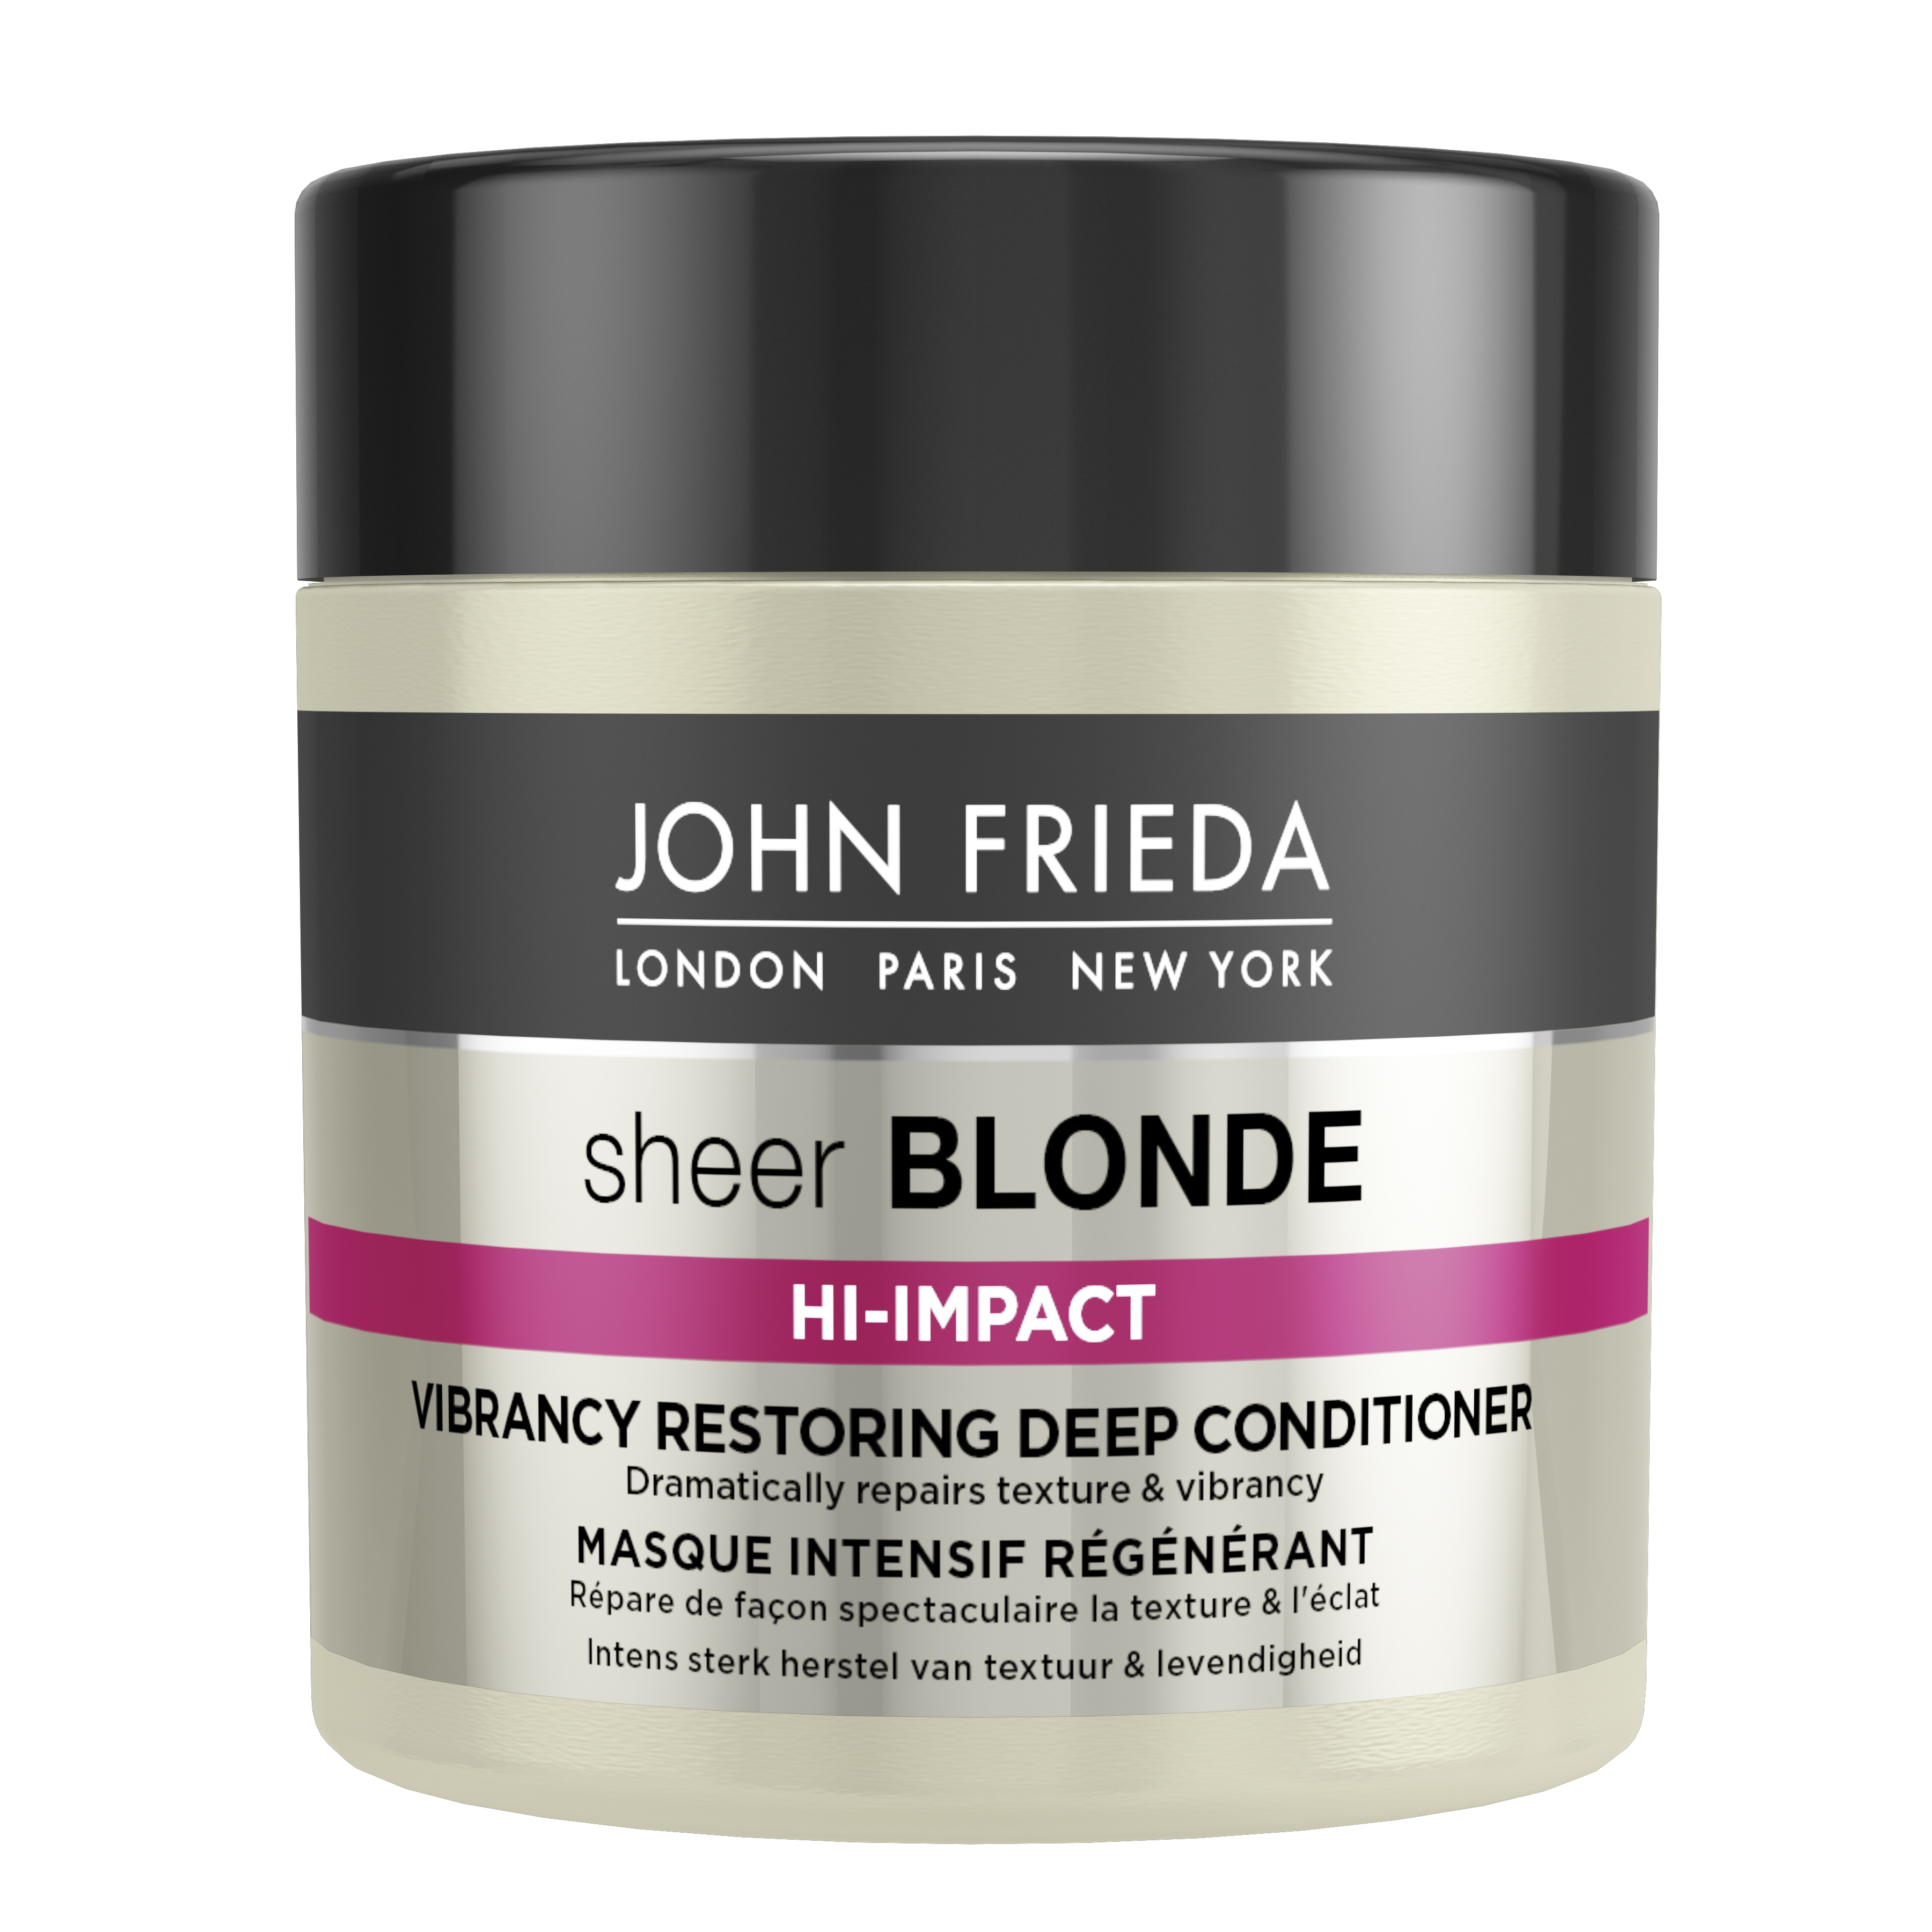 Sheer Blonde Hi-Impact Deep Condtioner 150ml